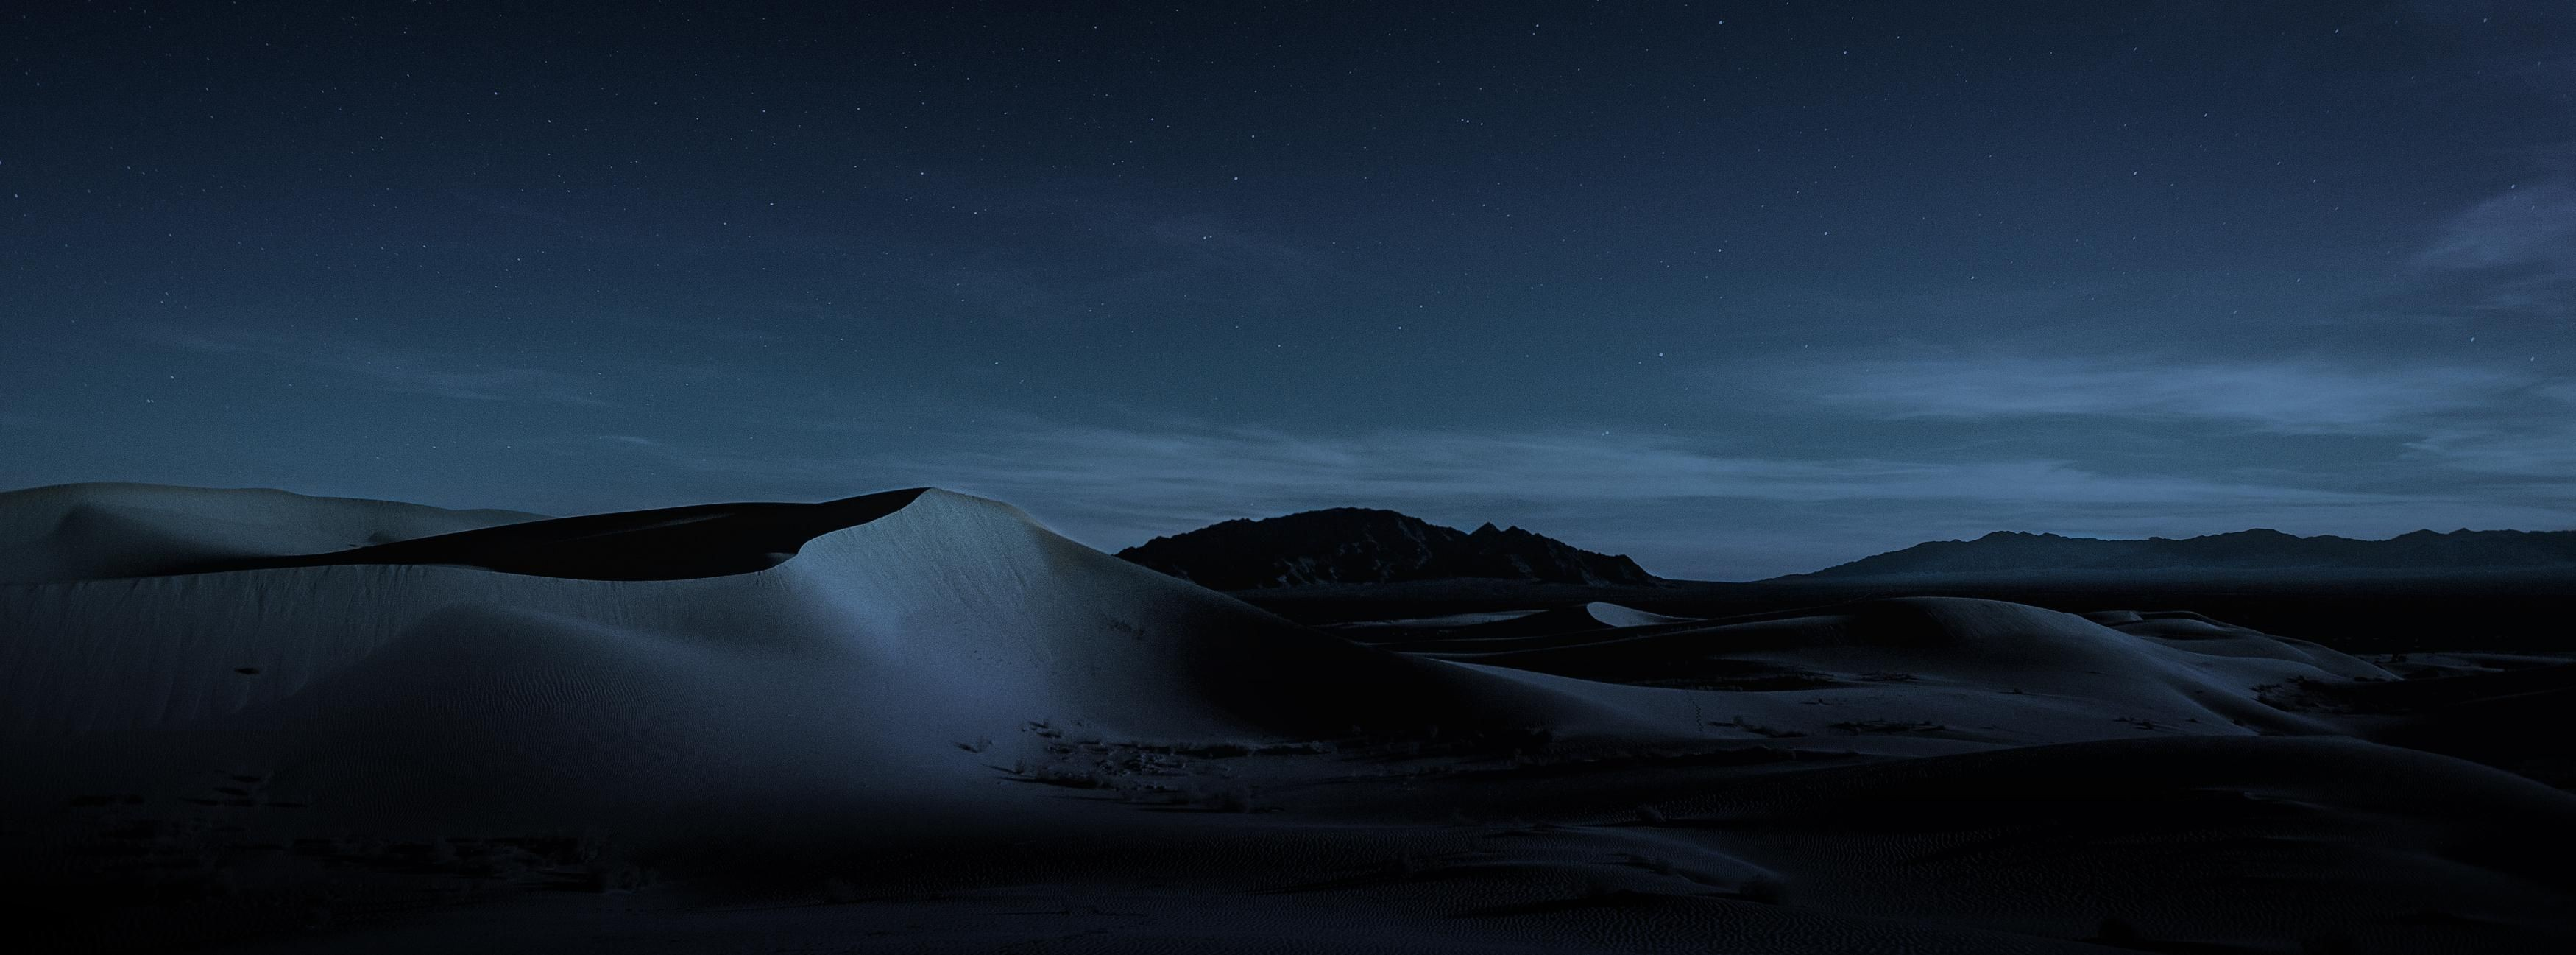 Wallpaper MacOS Mojave, Night, Dunes, 4K, OS #18885